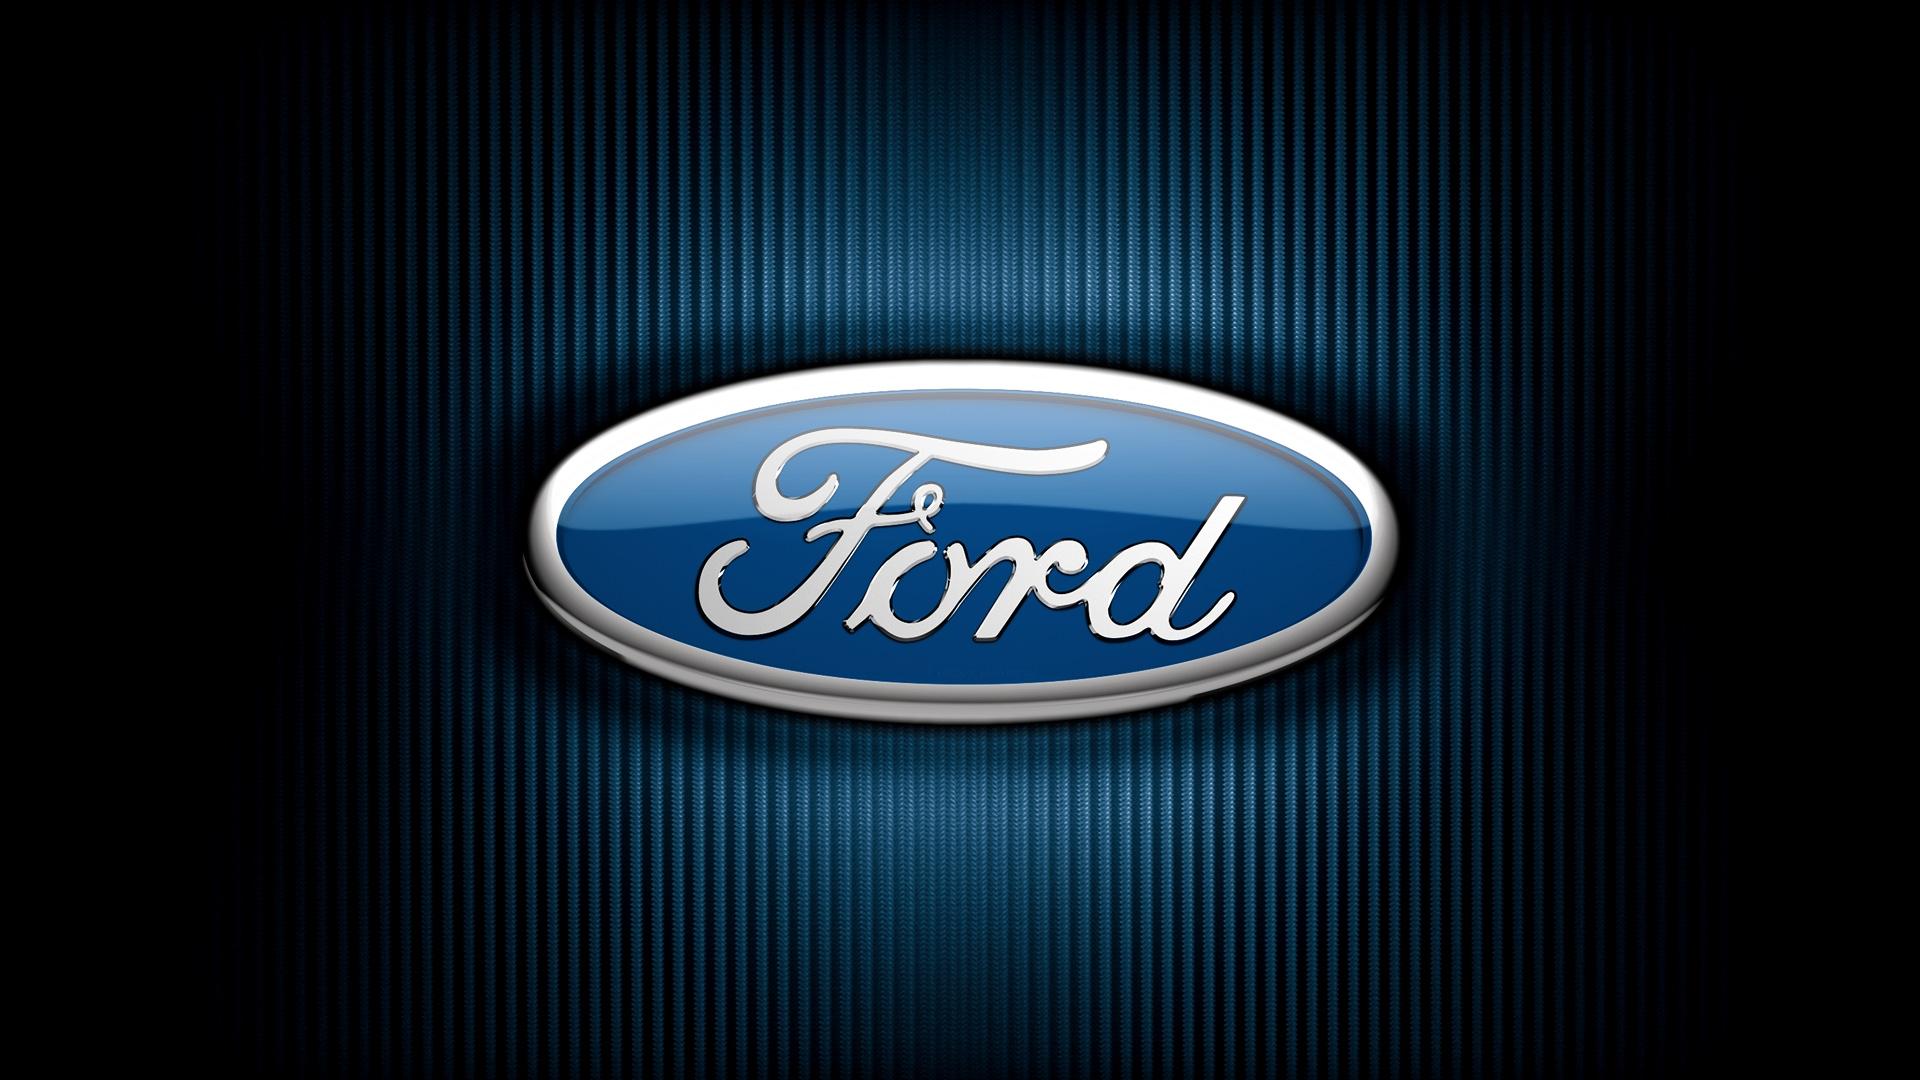 ford logo wallpaper for android wallpaper 1jpg 1920x1080